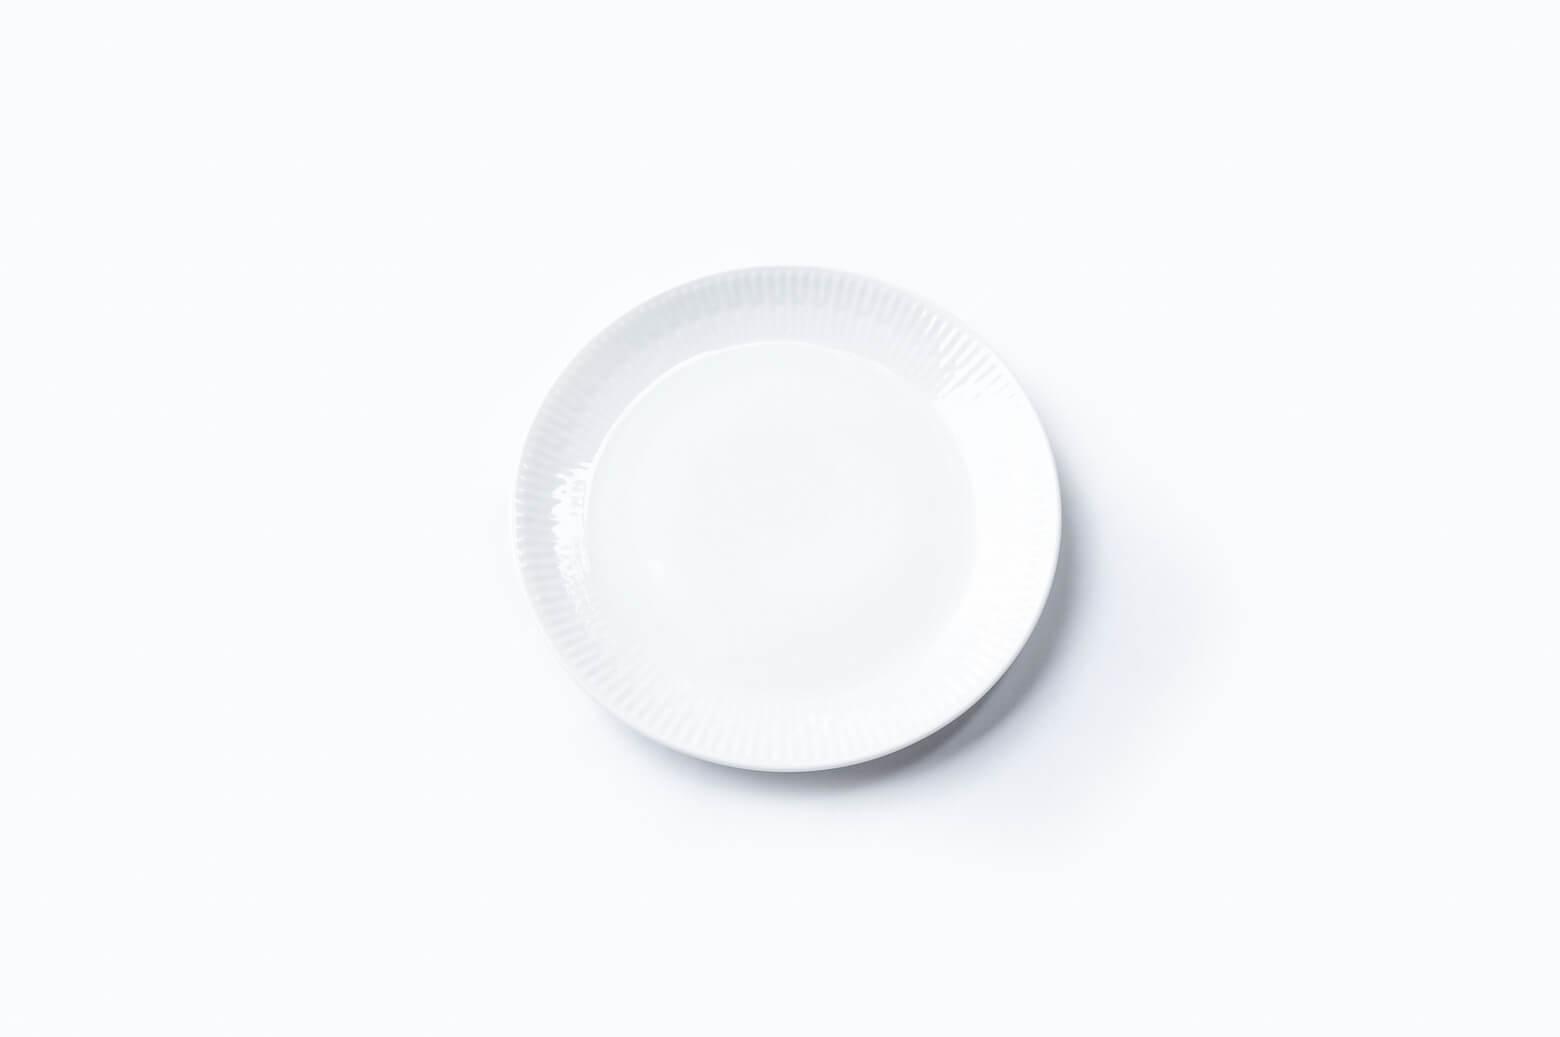 aida relief series Dessert Plate 20cm / アイーダ リリーフ デザート プレート 4枚セット 北欧食器